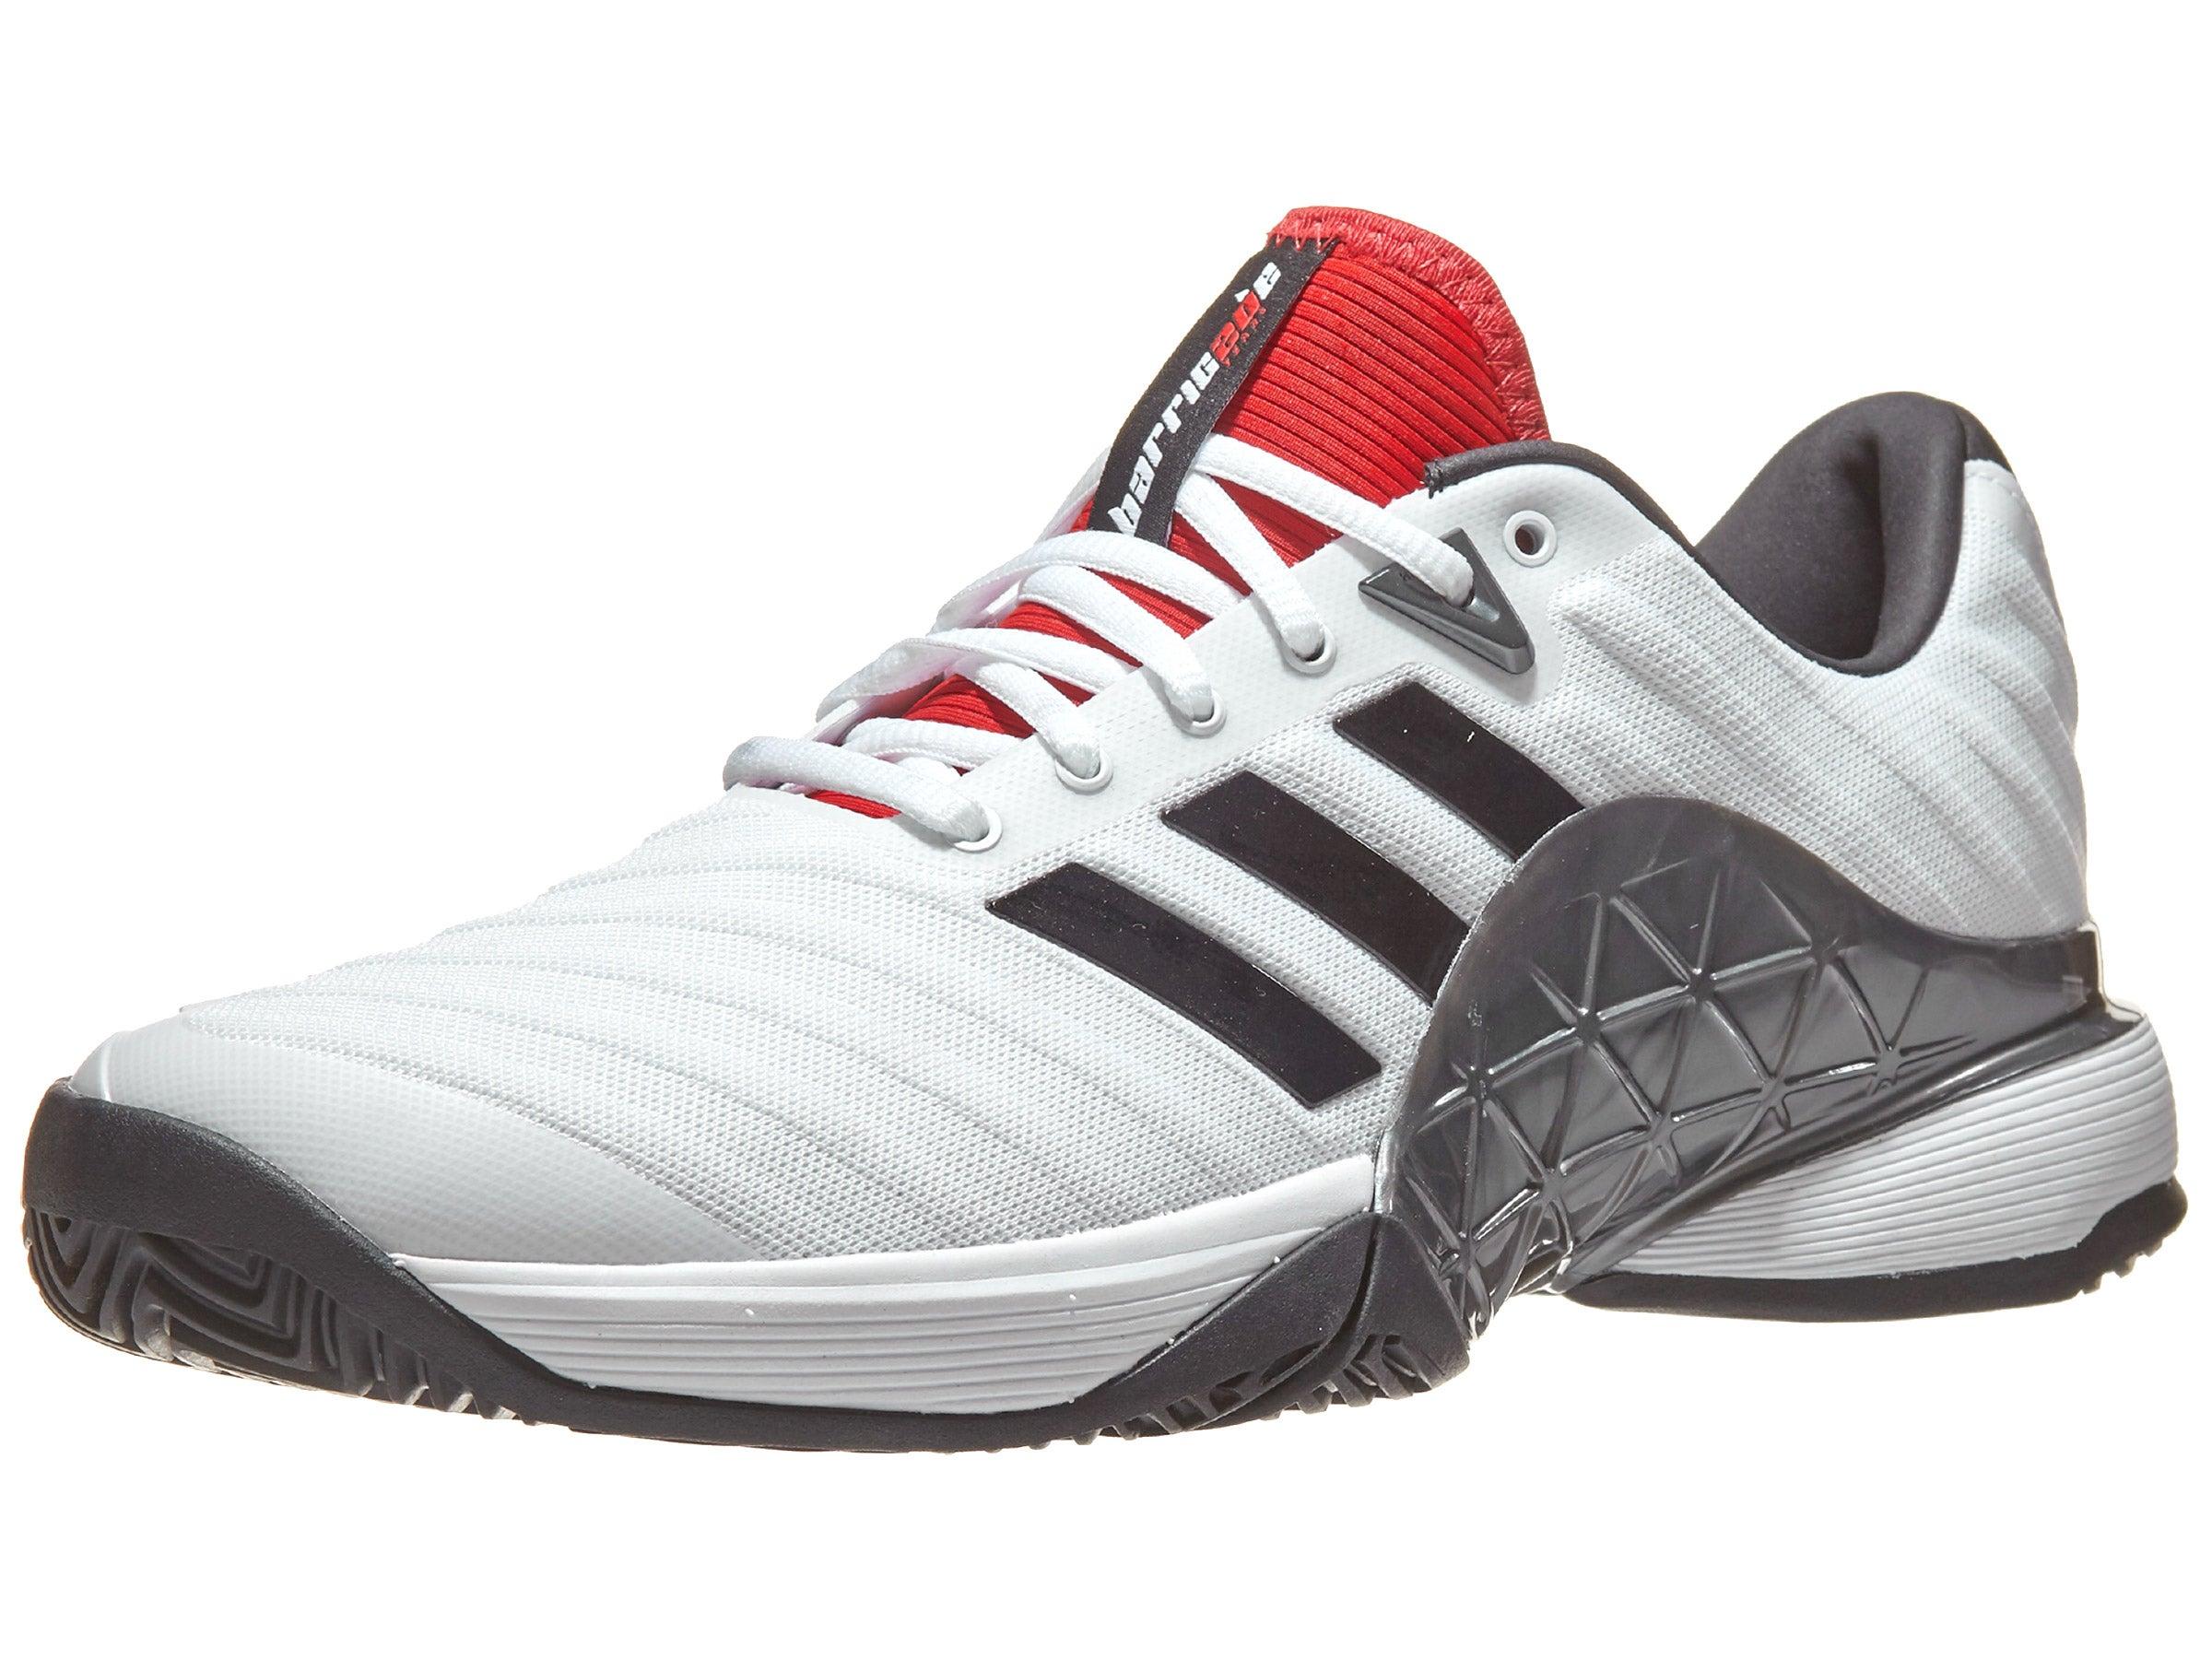 The Best Pickleball Shoes for Men: adidas Barricade 2018 tennis shoe